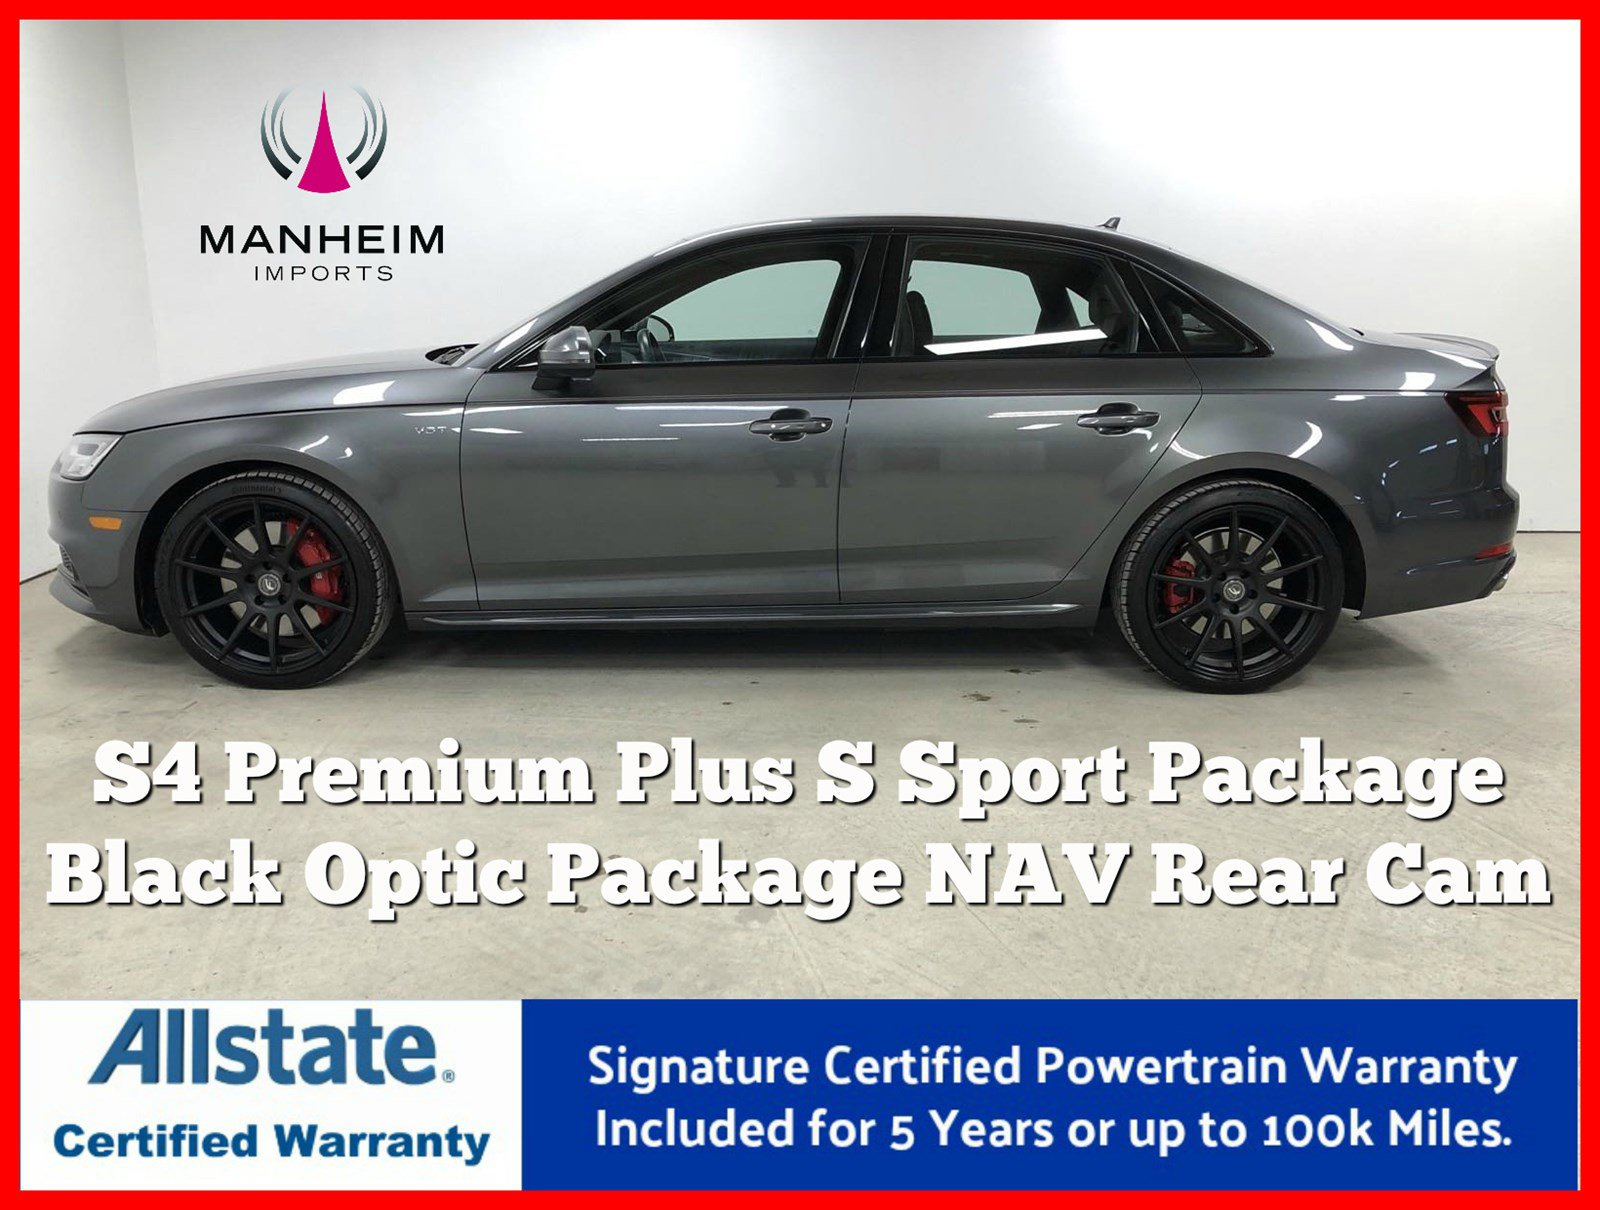 Pre-Owned 2018 Audi S4 Premium Plus S Sport Package